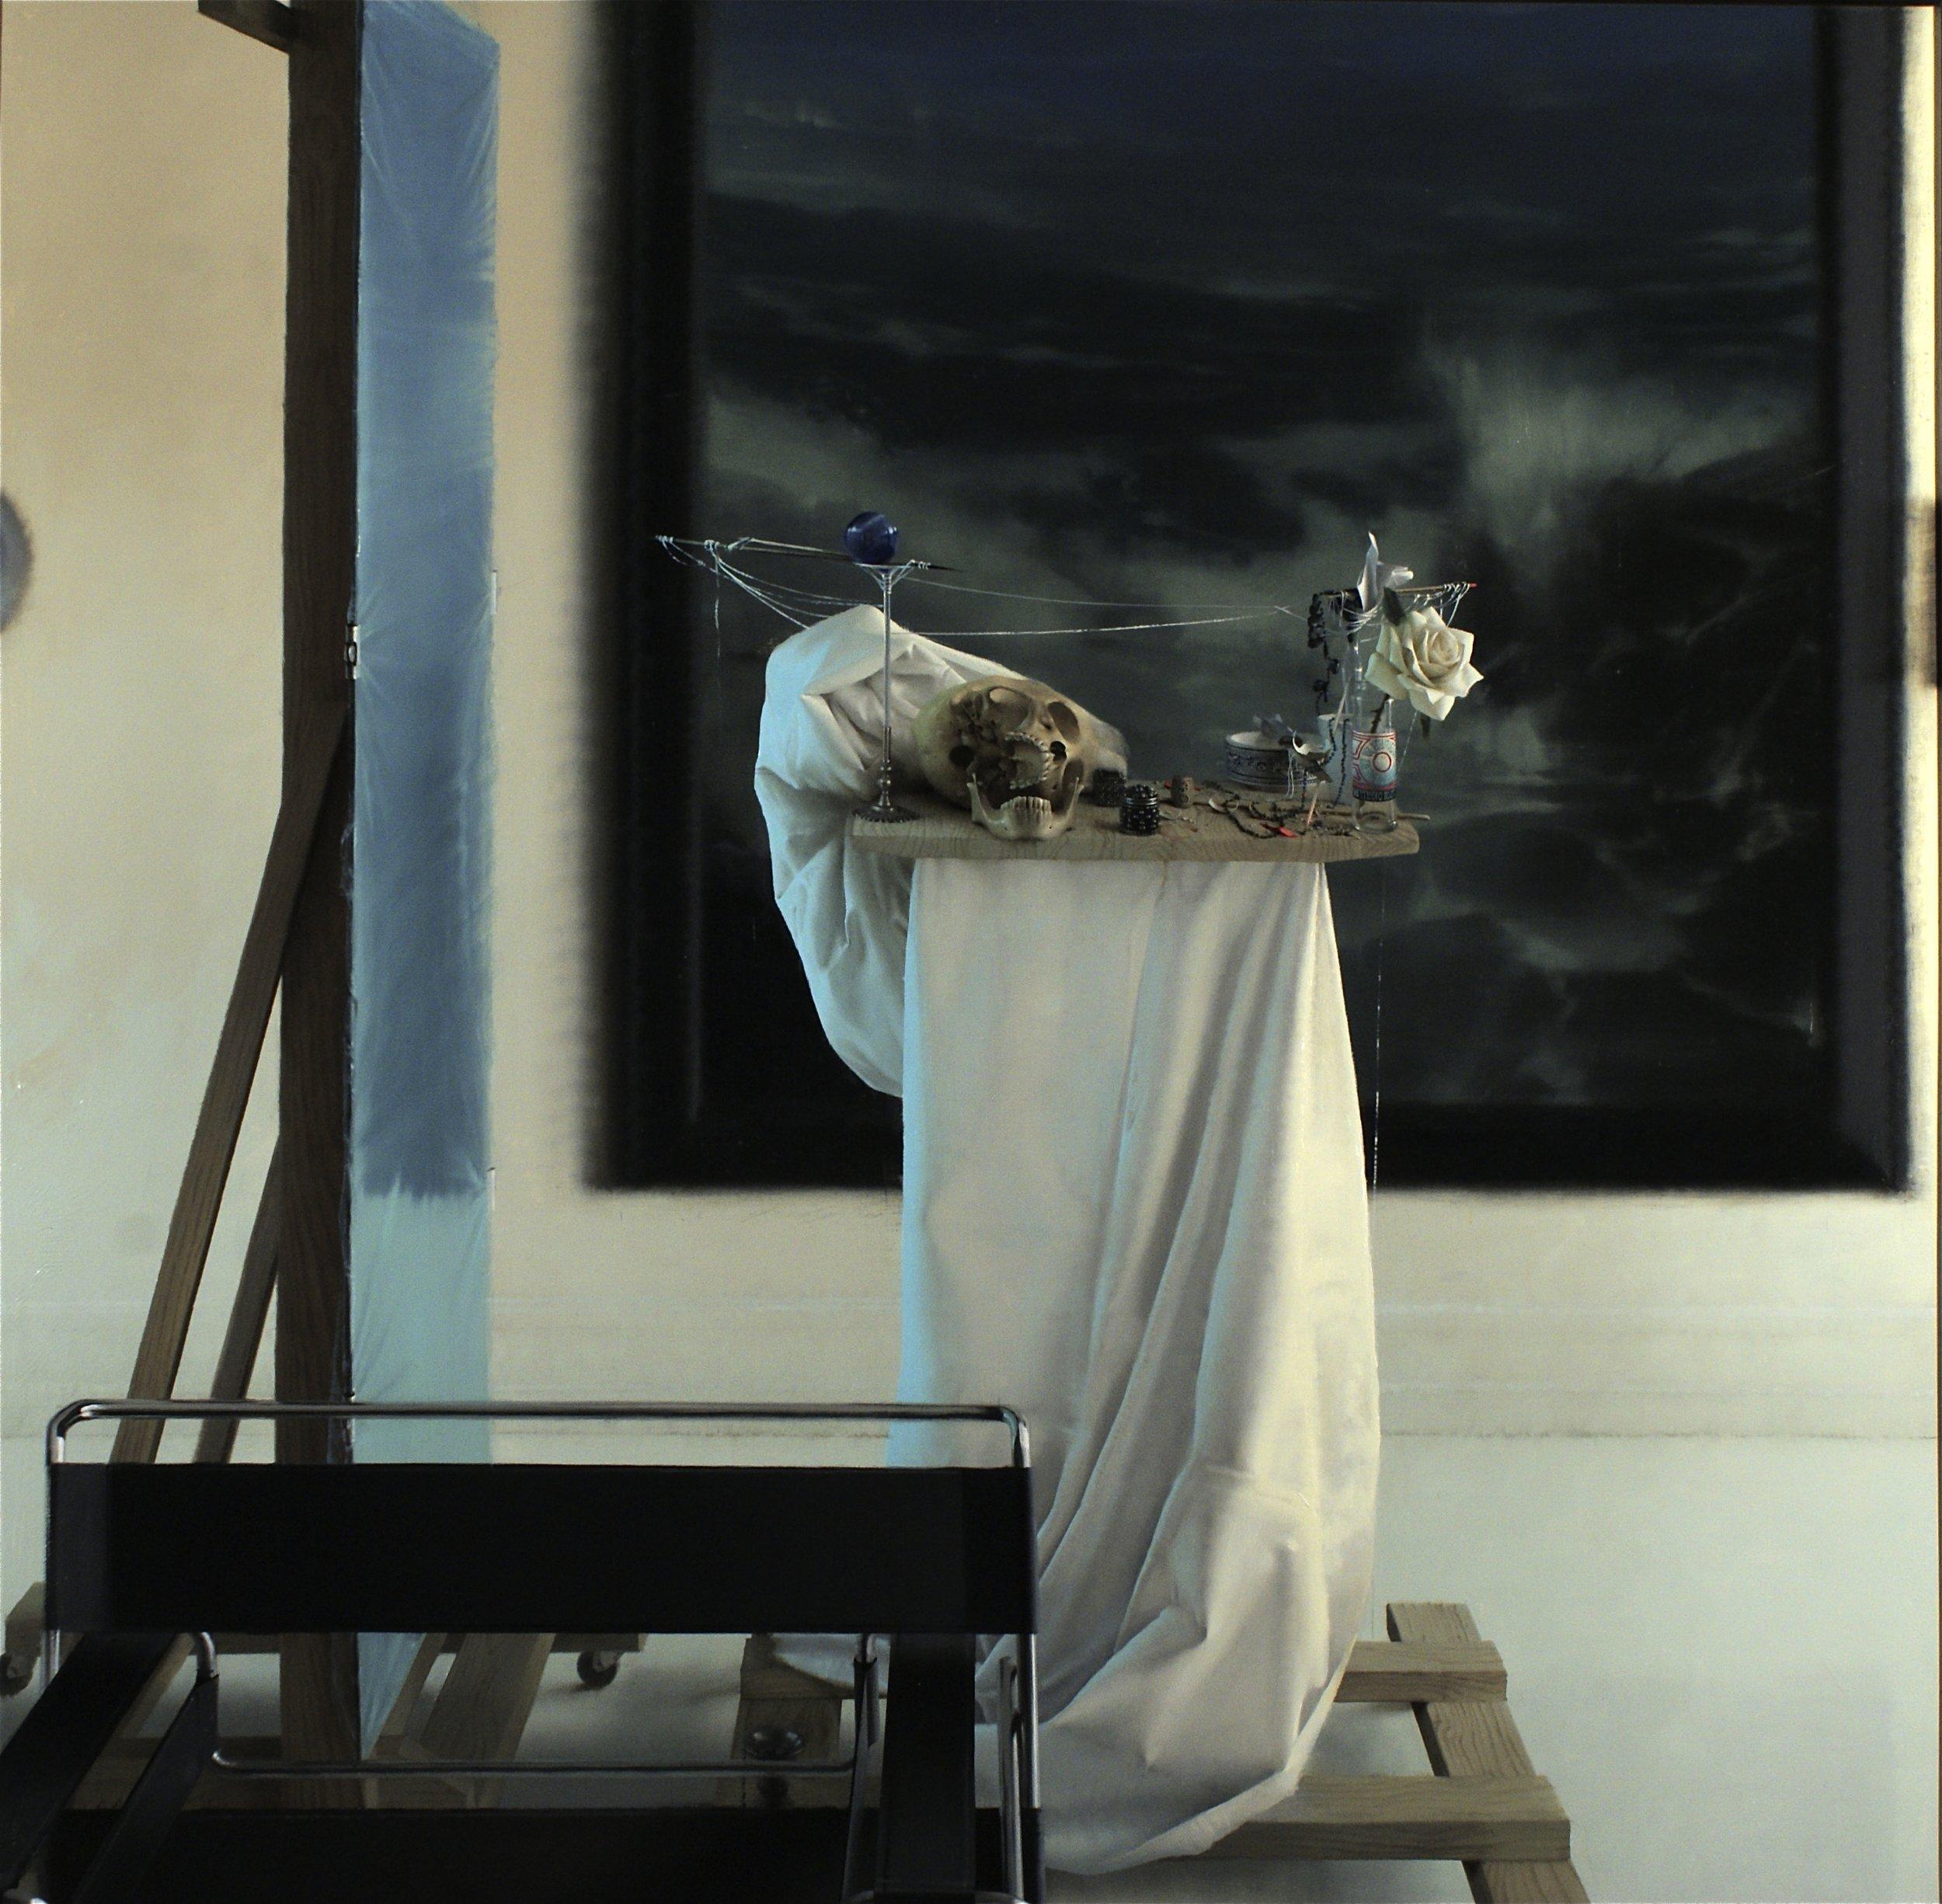 Daniel Sprick,  Through My Fingers, 2010